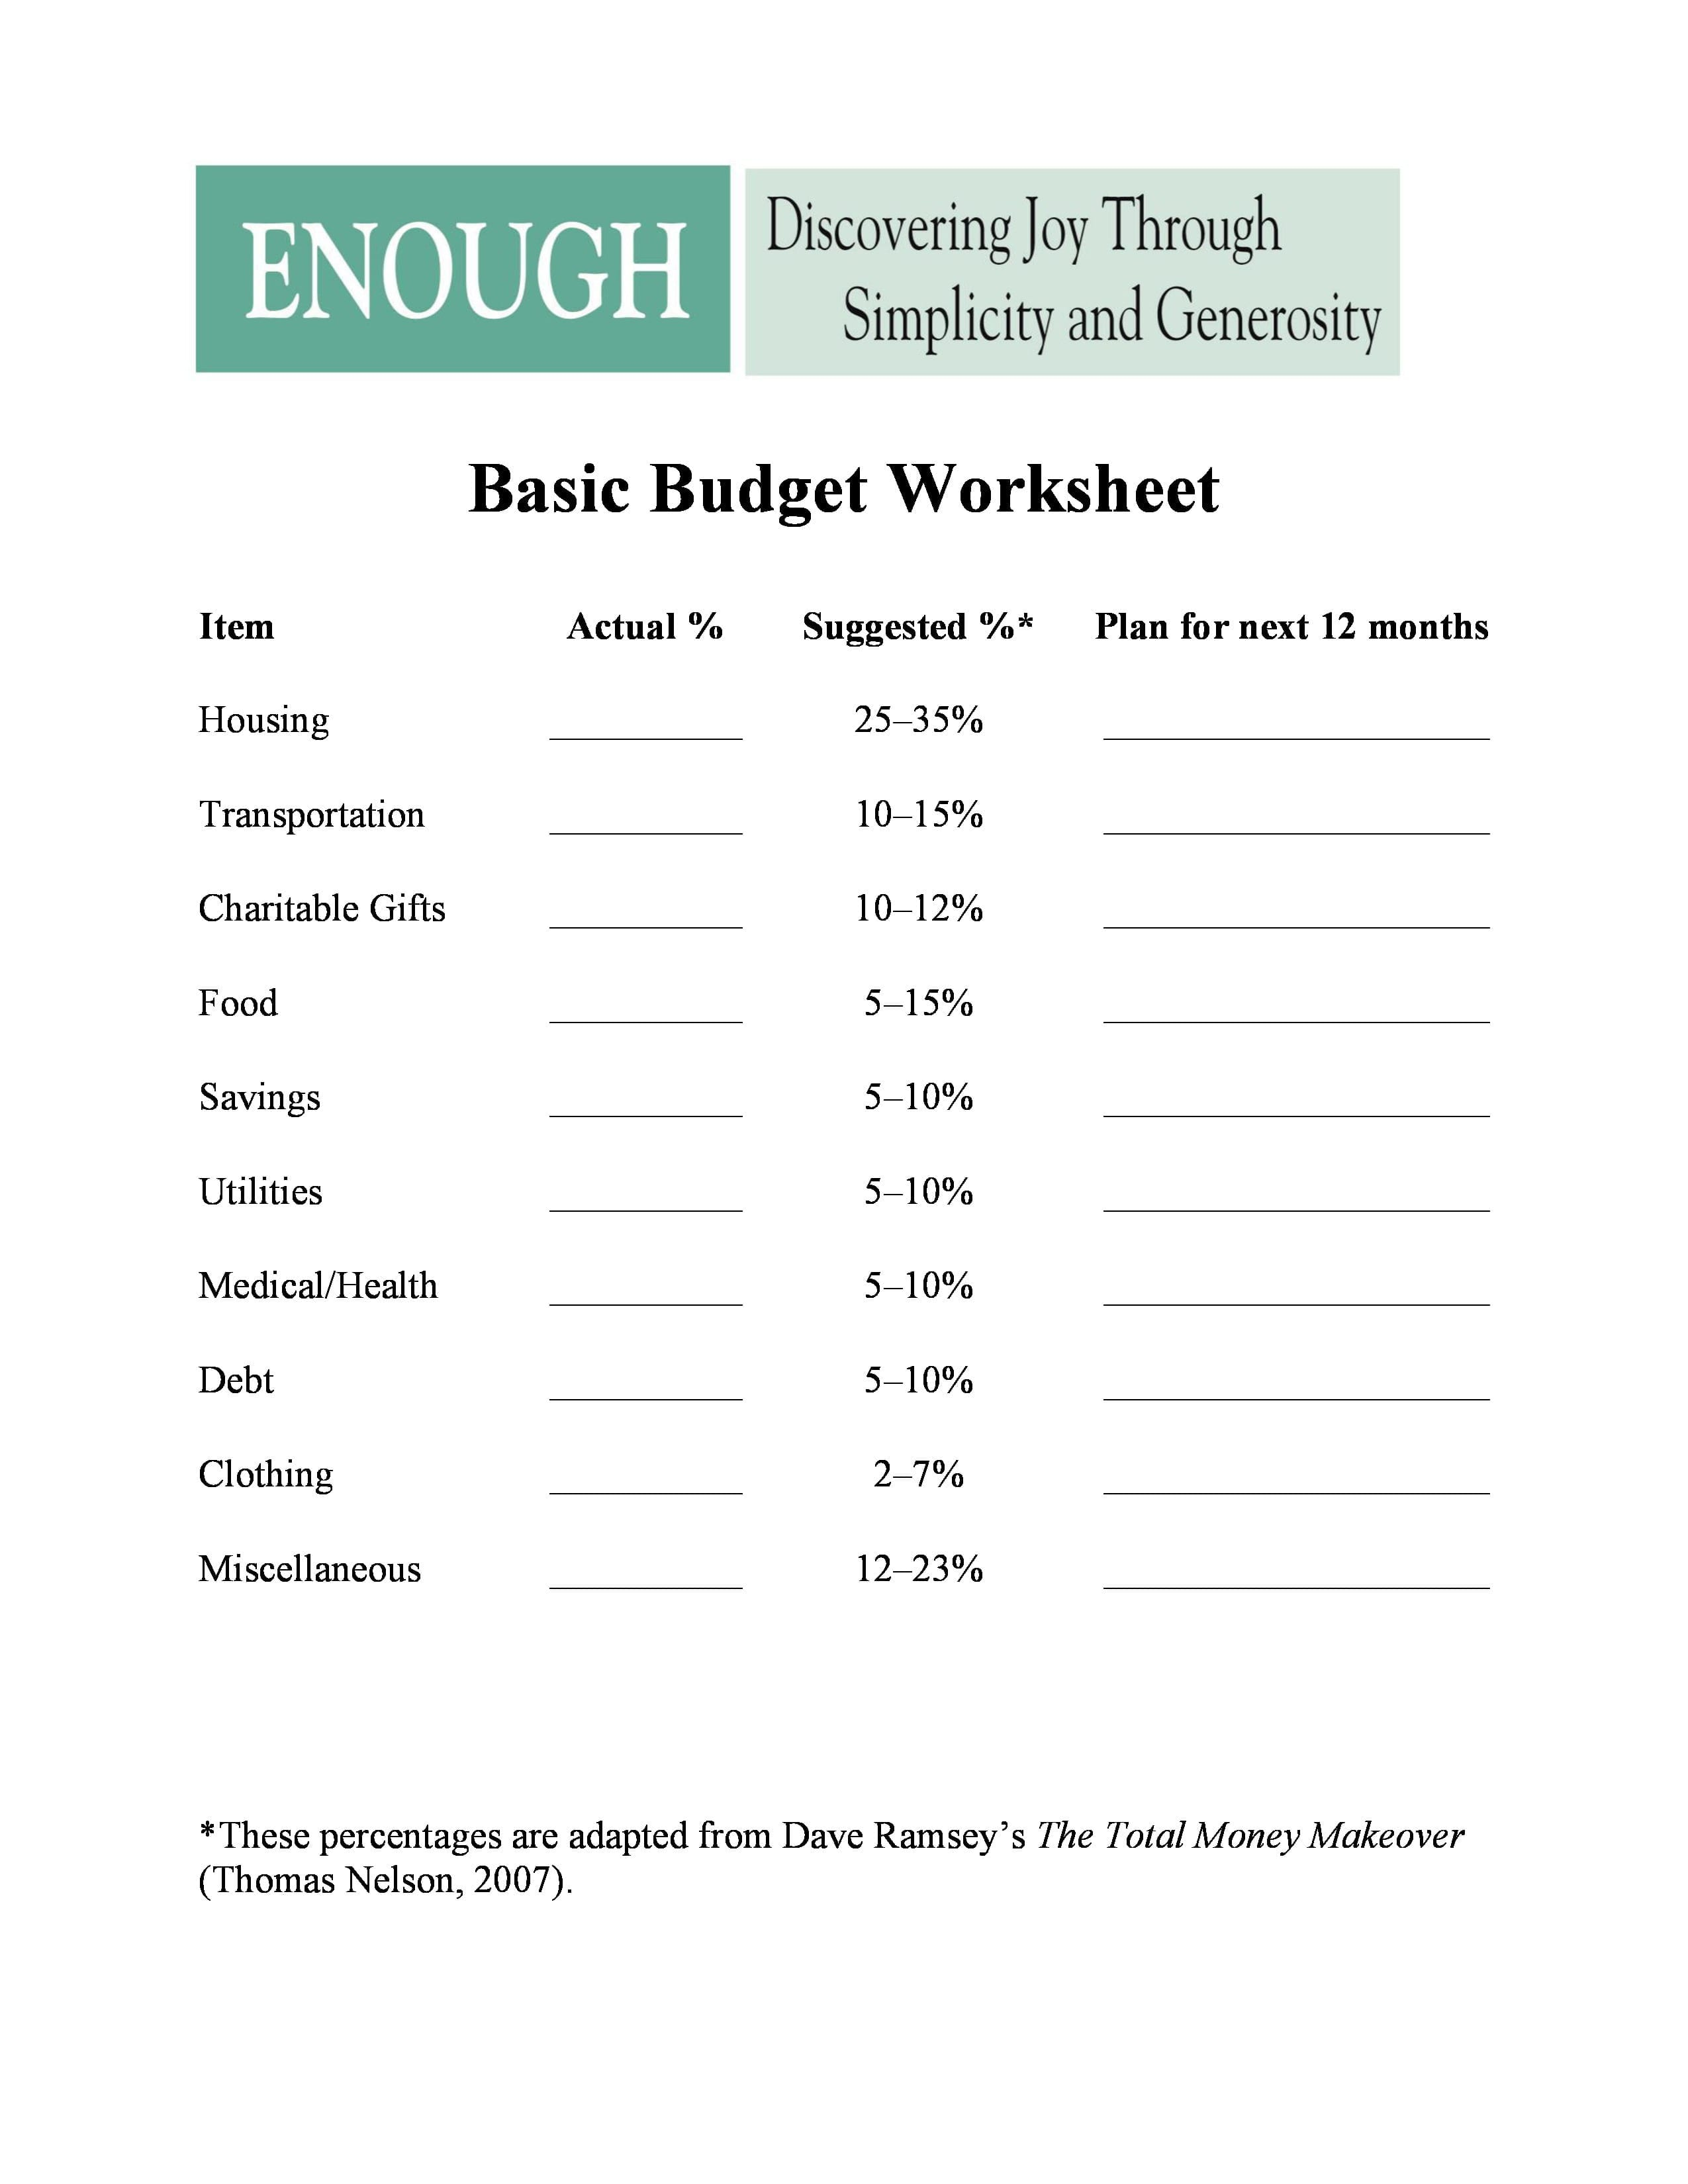 Basic Budget Worksheet Trinity United Methodist Church